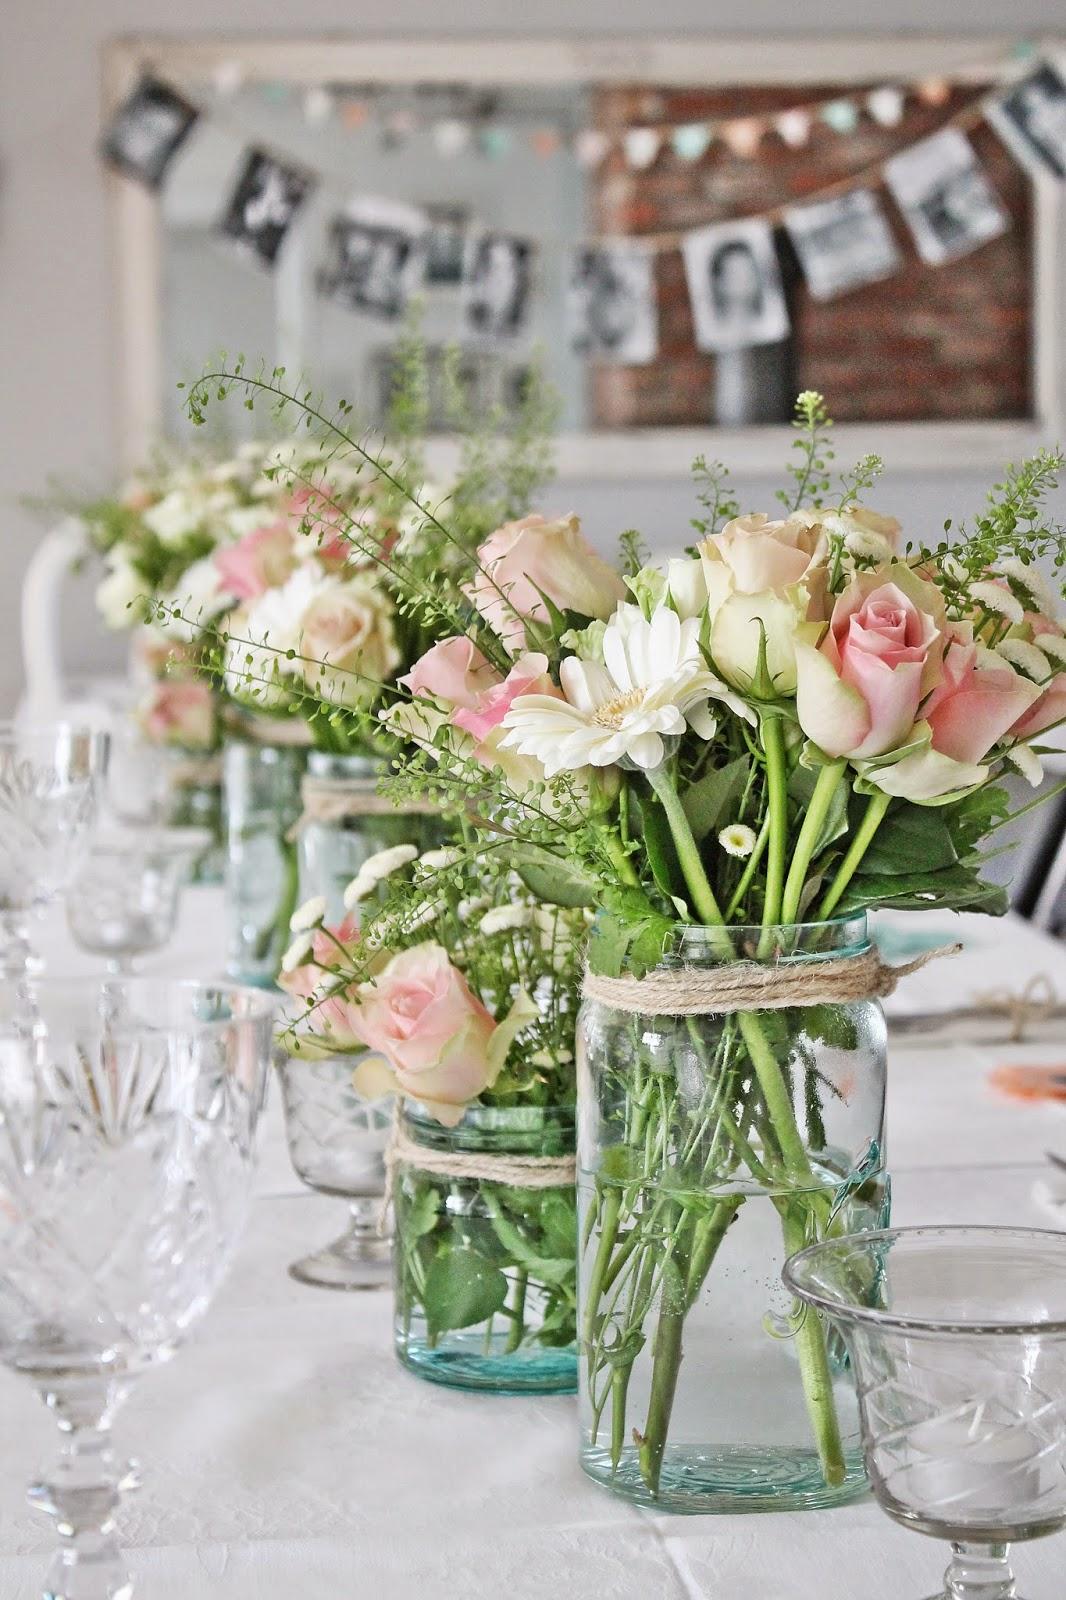 21 Fresh Cut Spring Flower Arrangements And Bouquets Mom Spark